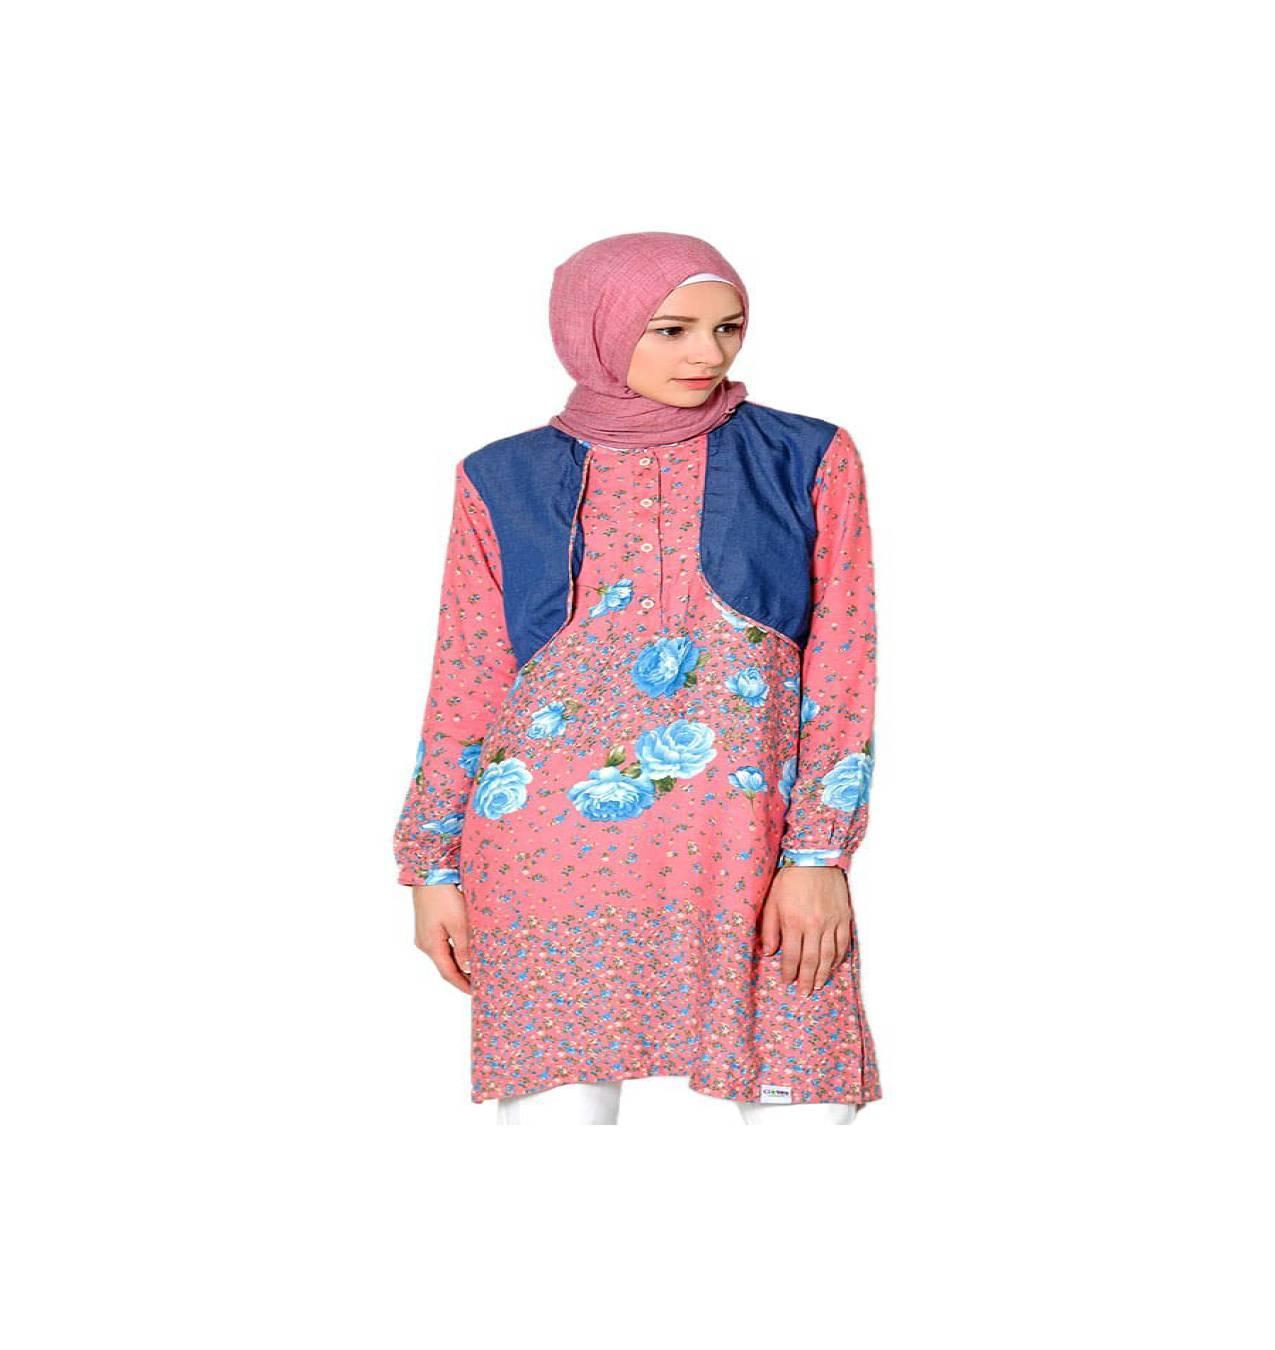 Cardingan MURAH Baju Muslim Clover Clothing Tunic Shelby - Salem -